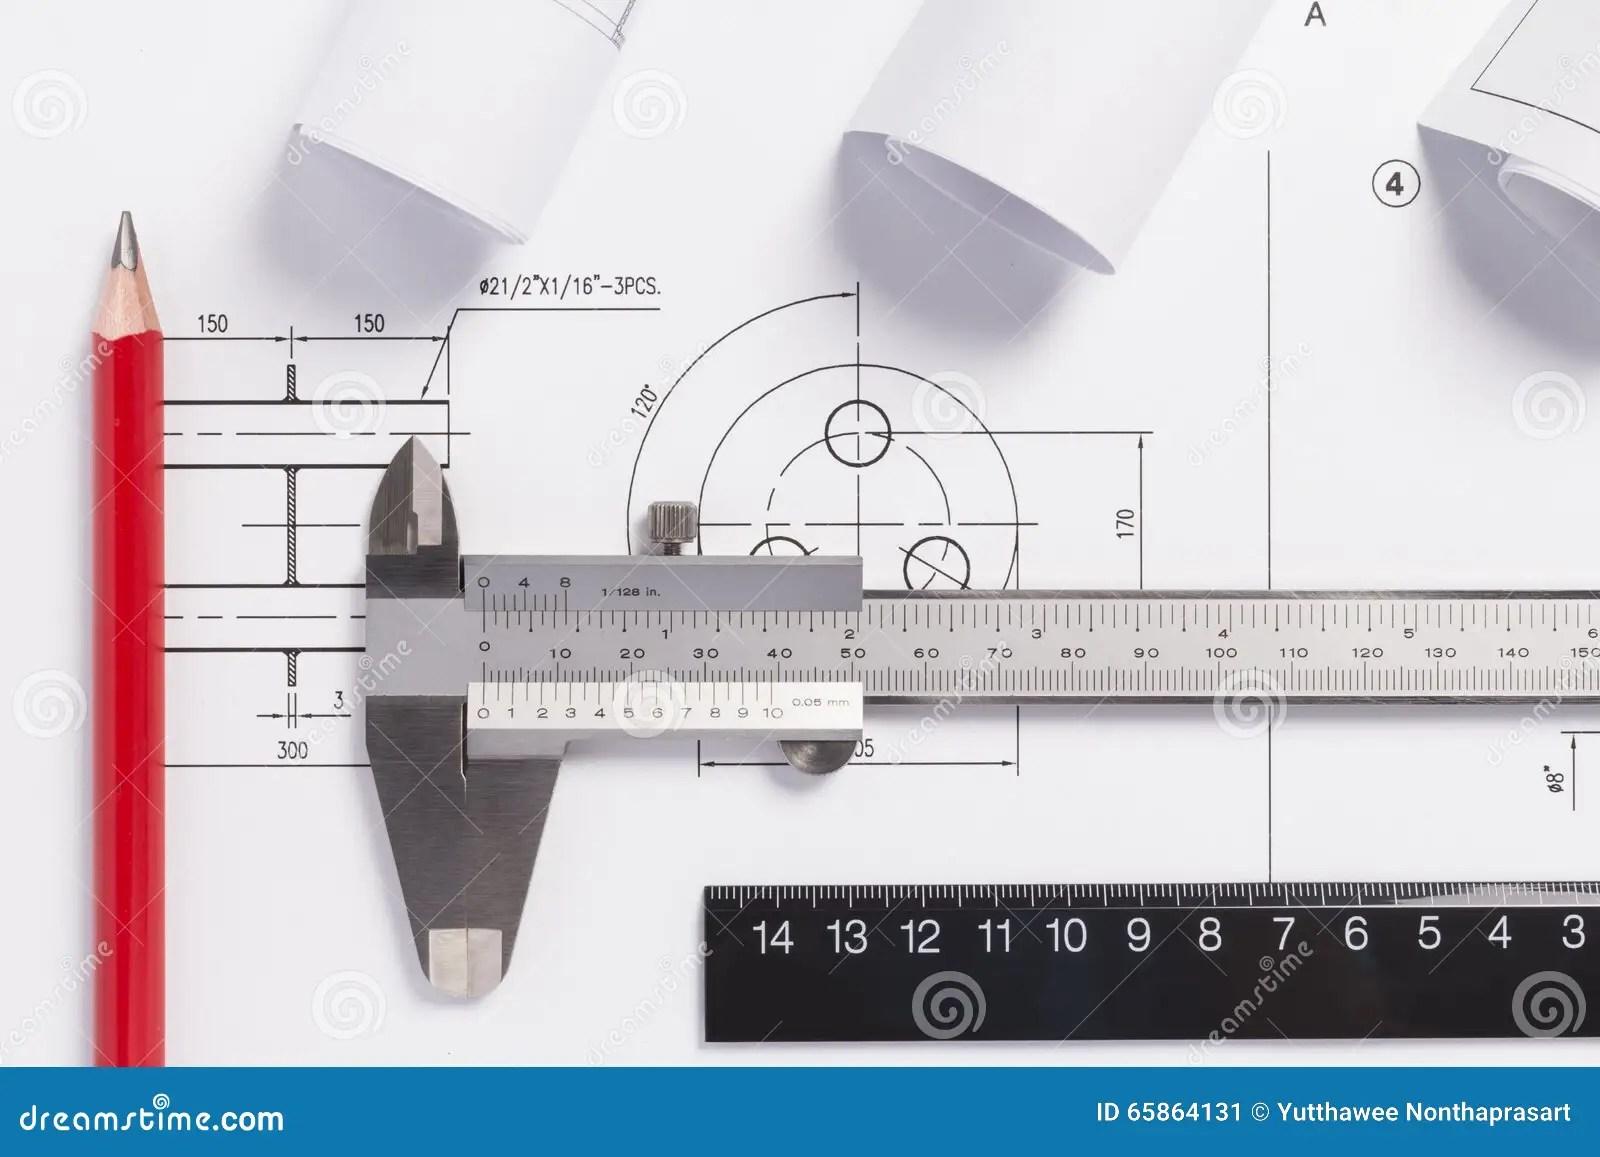 hight resolution of engineering drawings metal detail and vernier caliper